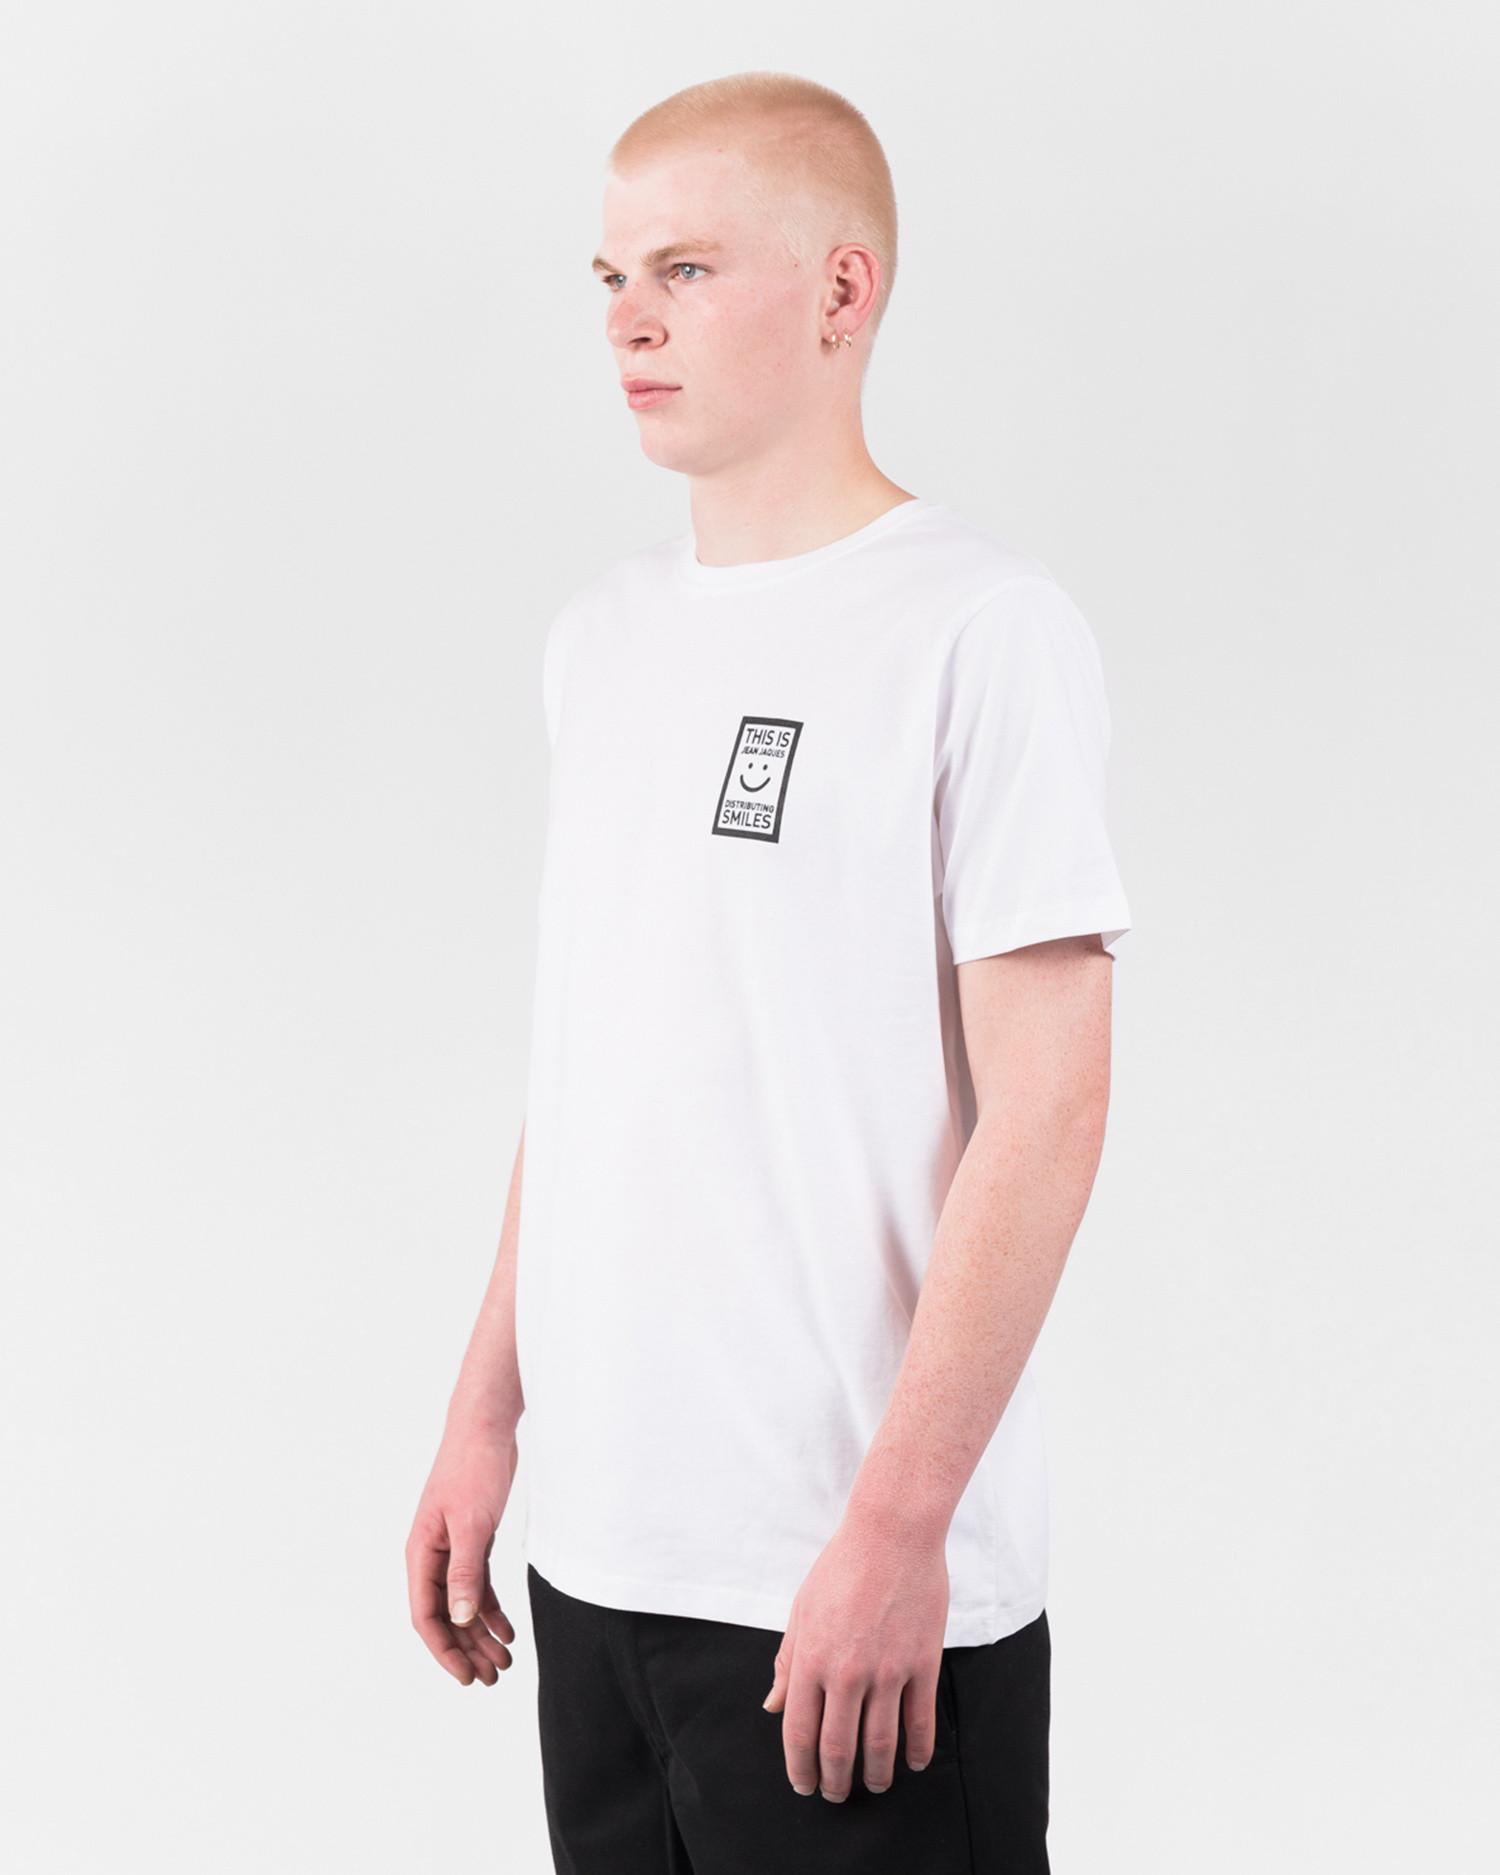 Jean Jaques Basic Logo T-Shirt White/Black